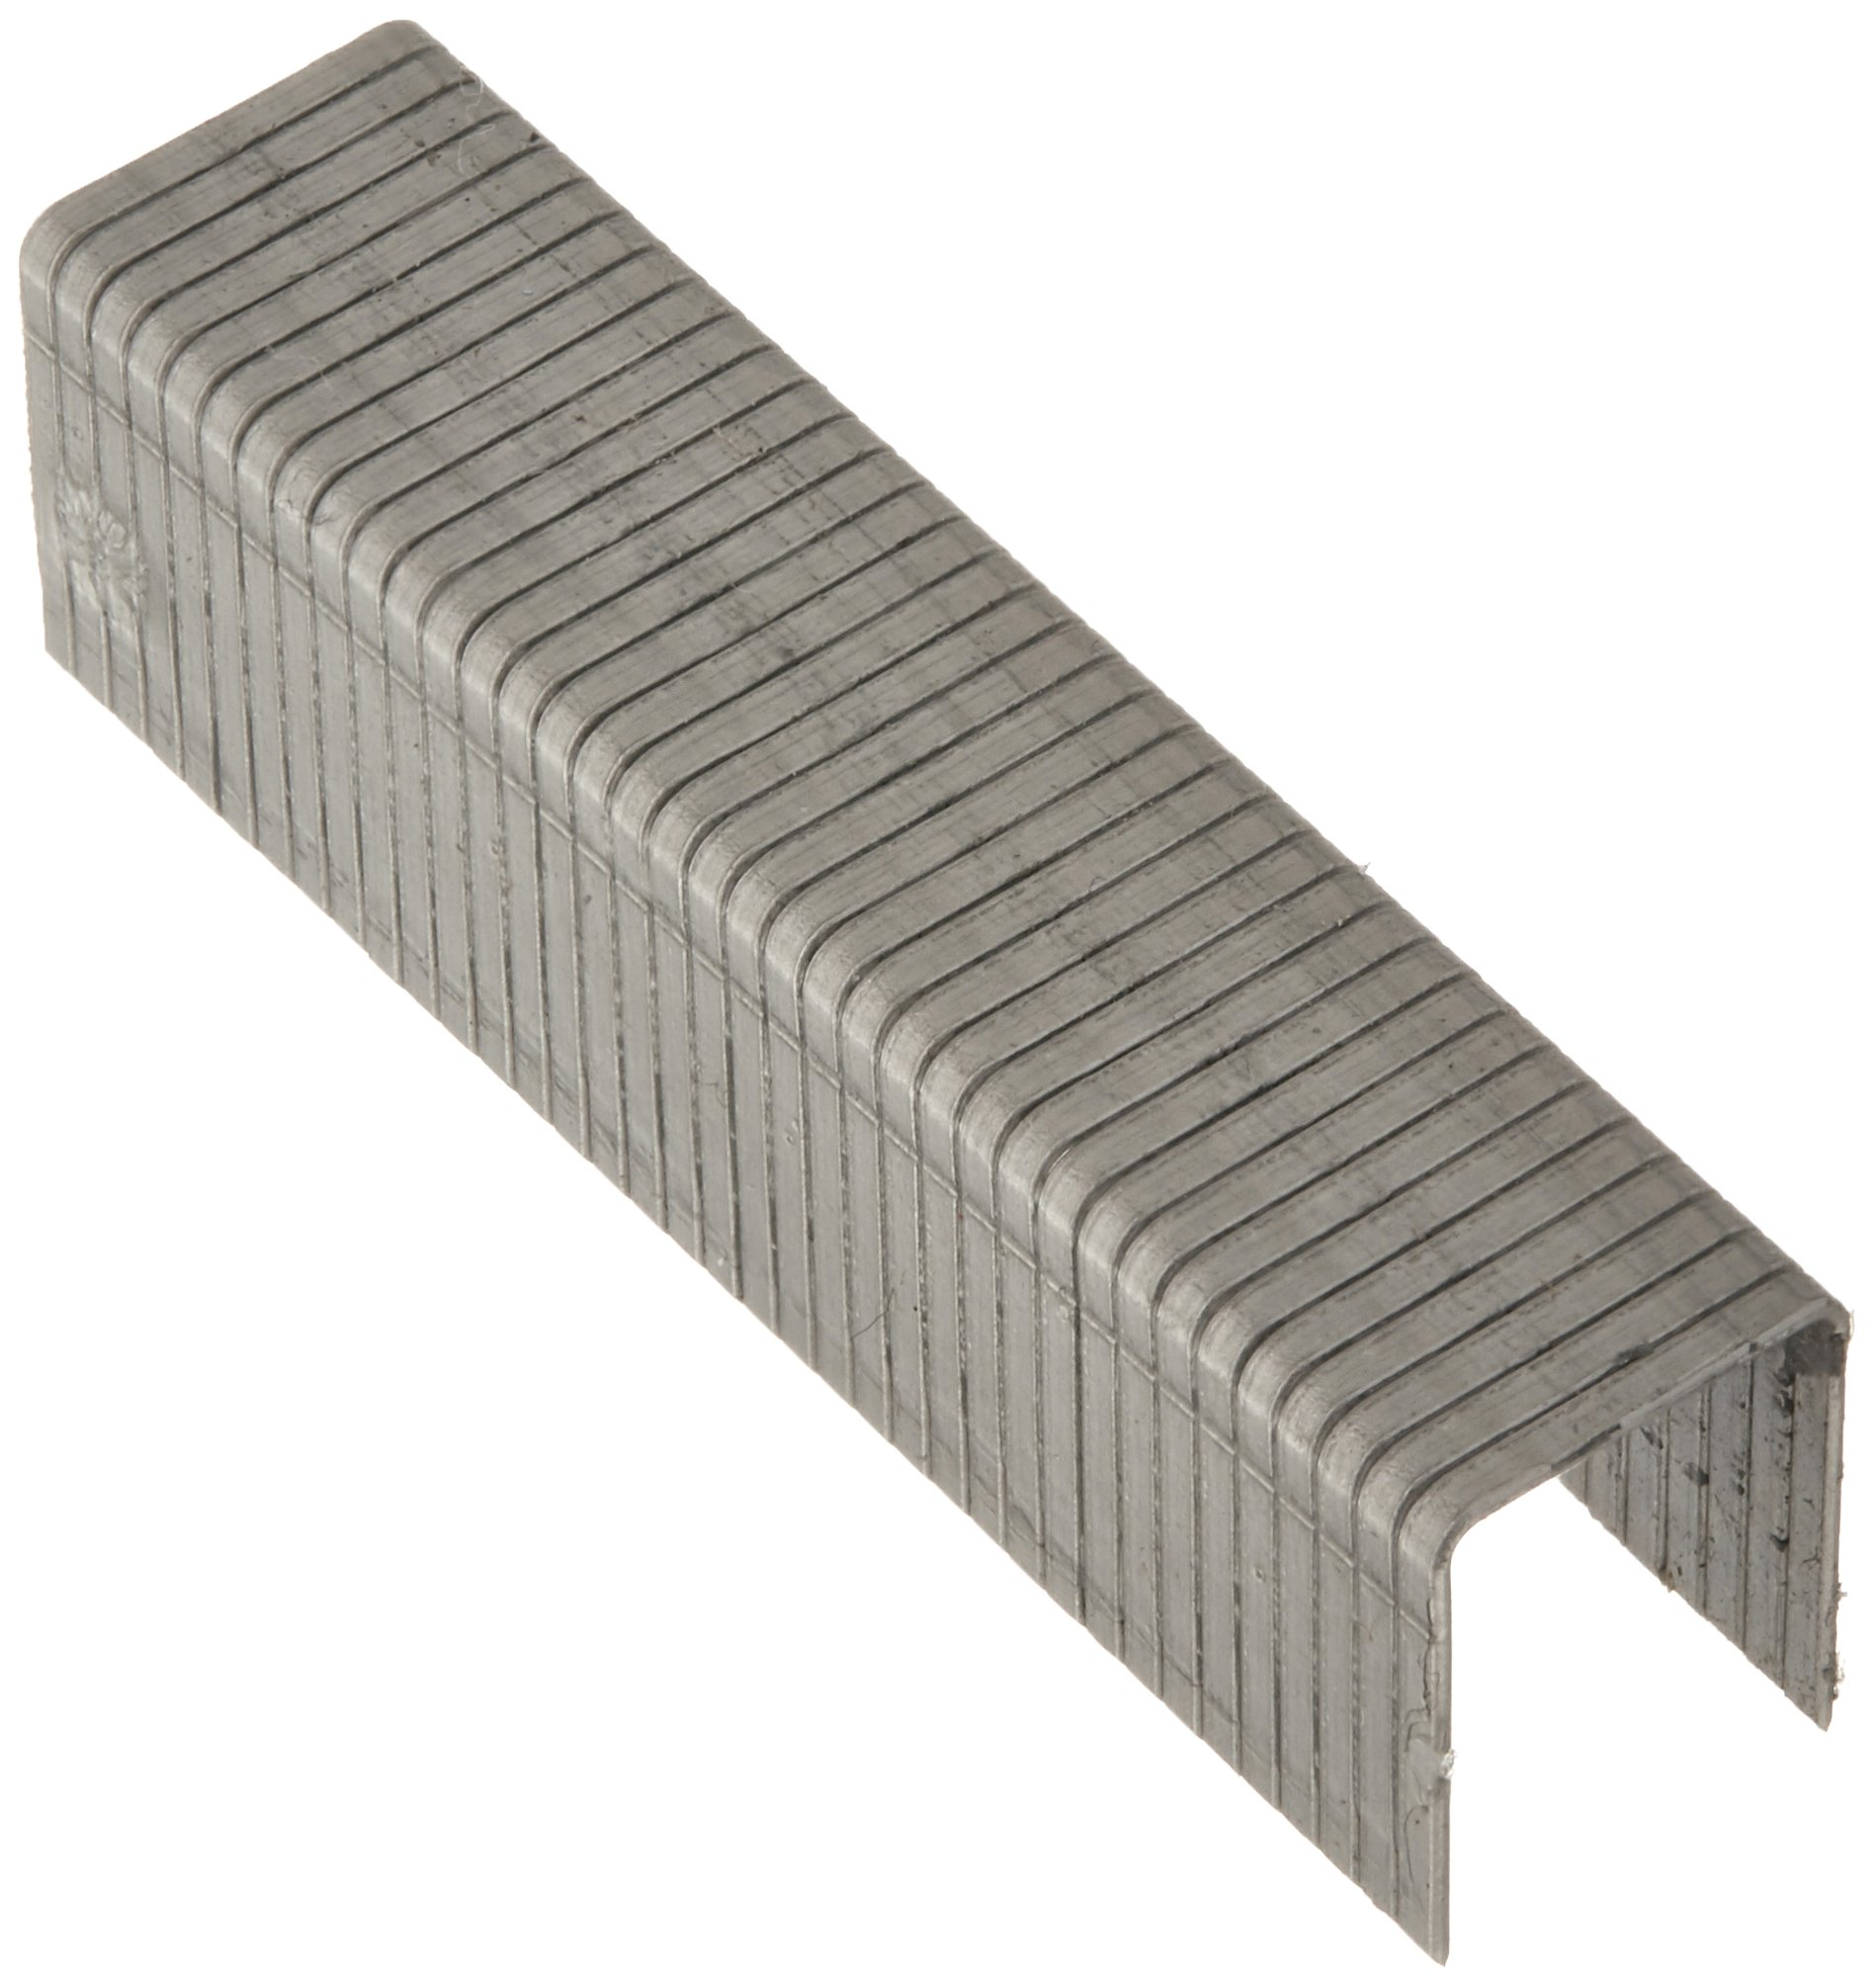 Arrow Fastener 508SS1 1/2'' T50 Stainless Steel Staples